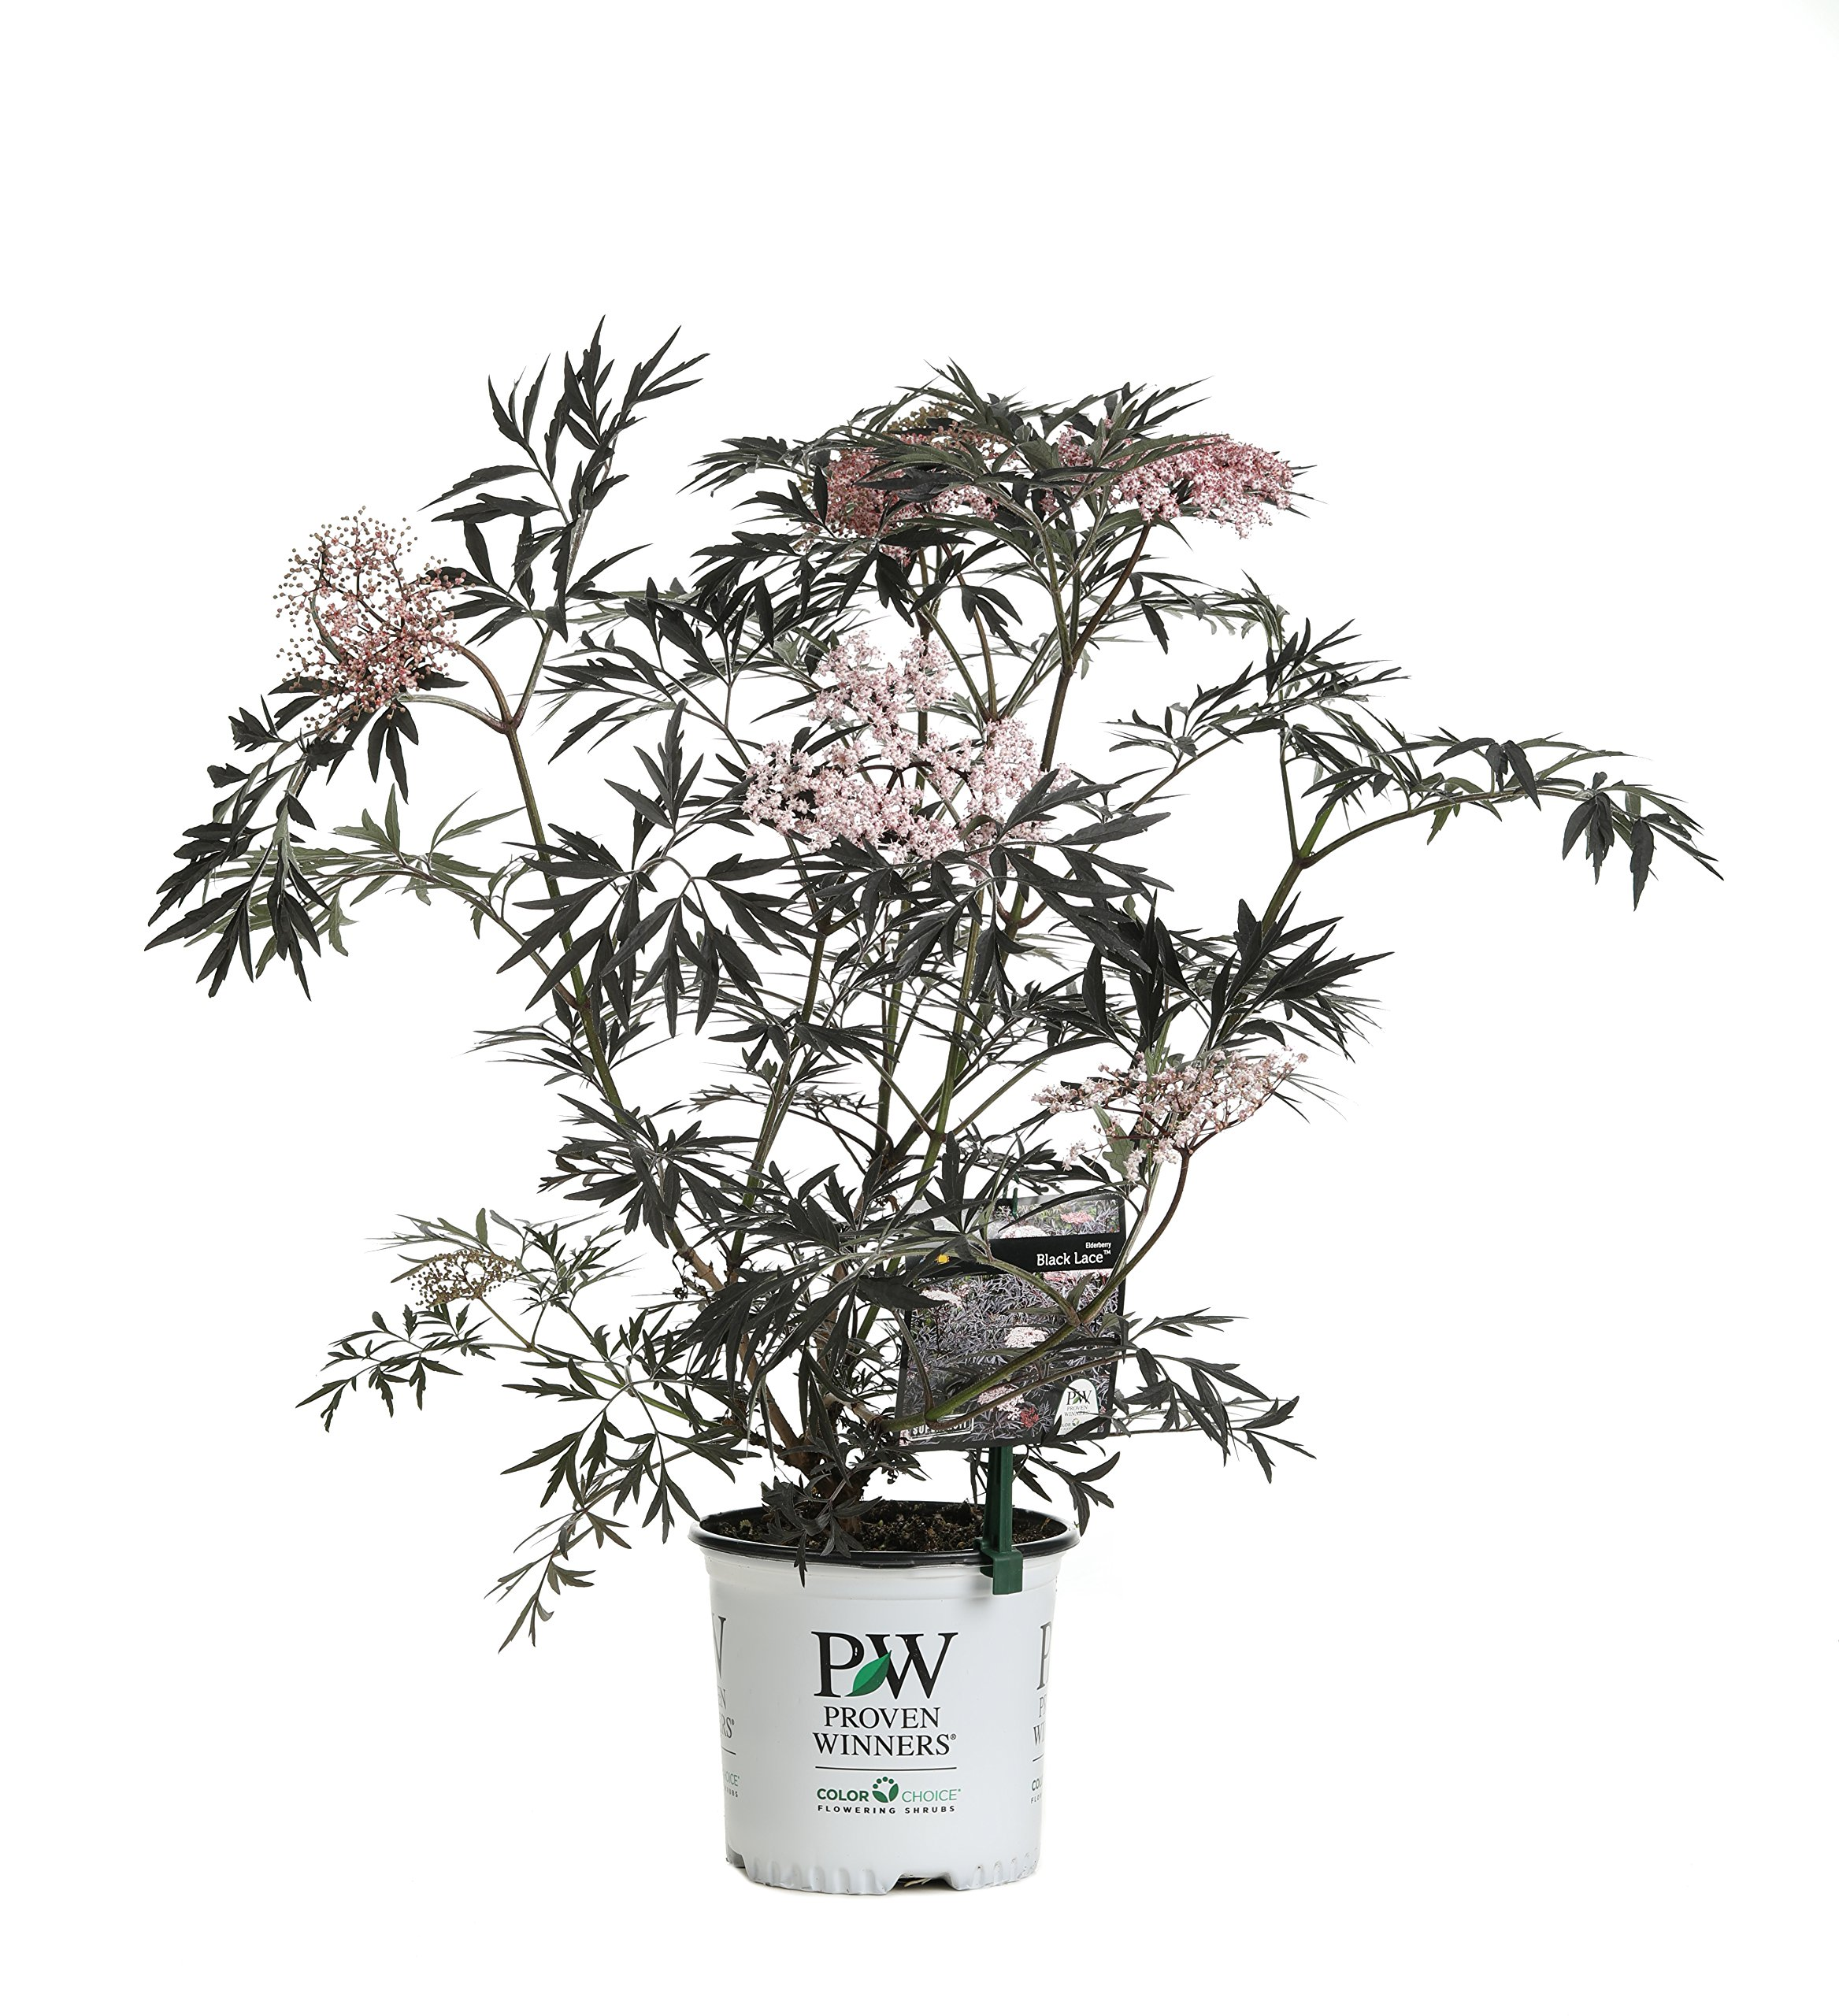 Black Lace Elderberry (Sambucus) Live Shrub, Pink Flowers, 1 Gallon